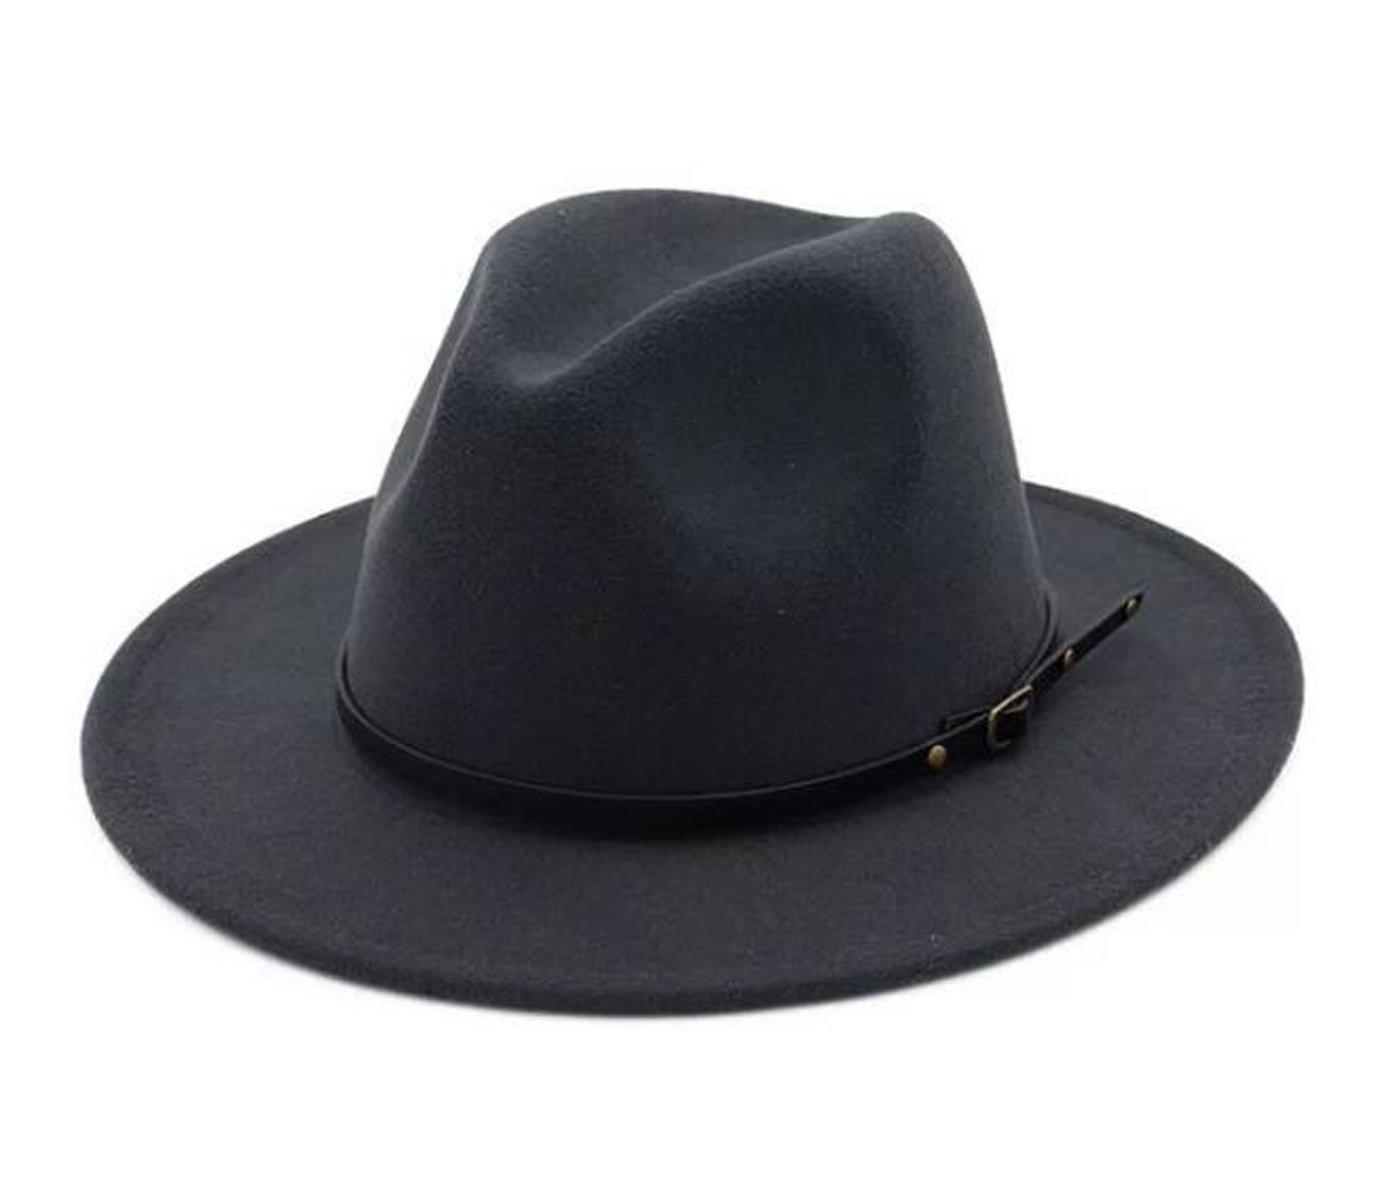 b50a2ad8ba8 Lanzom Womens Classic Wide Brim Floppy Panama Hat Belt Buckle Wool Fedora  Hat Black )